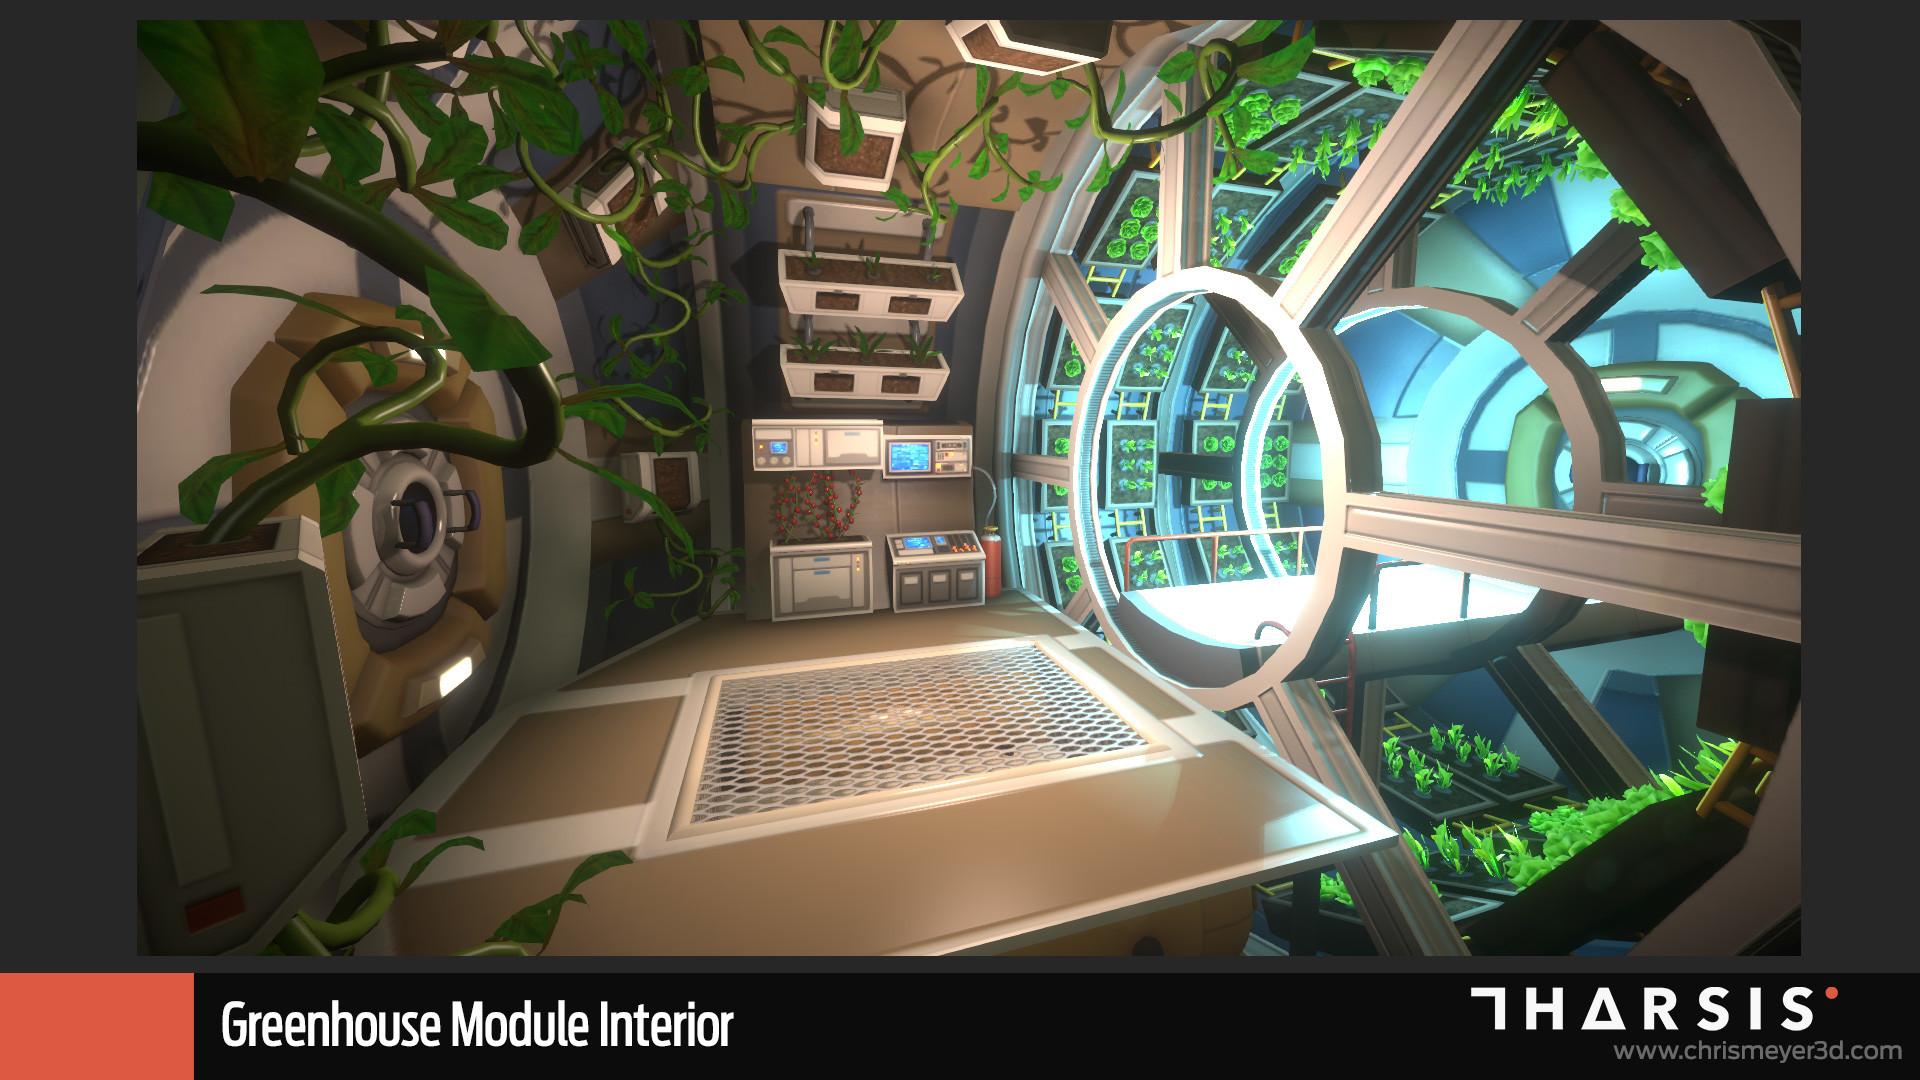 Chris meyer greenhouse interior2